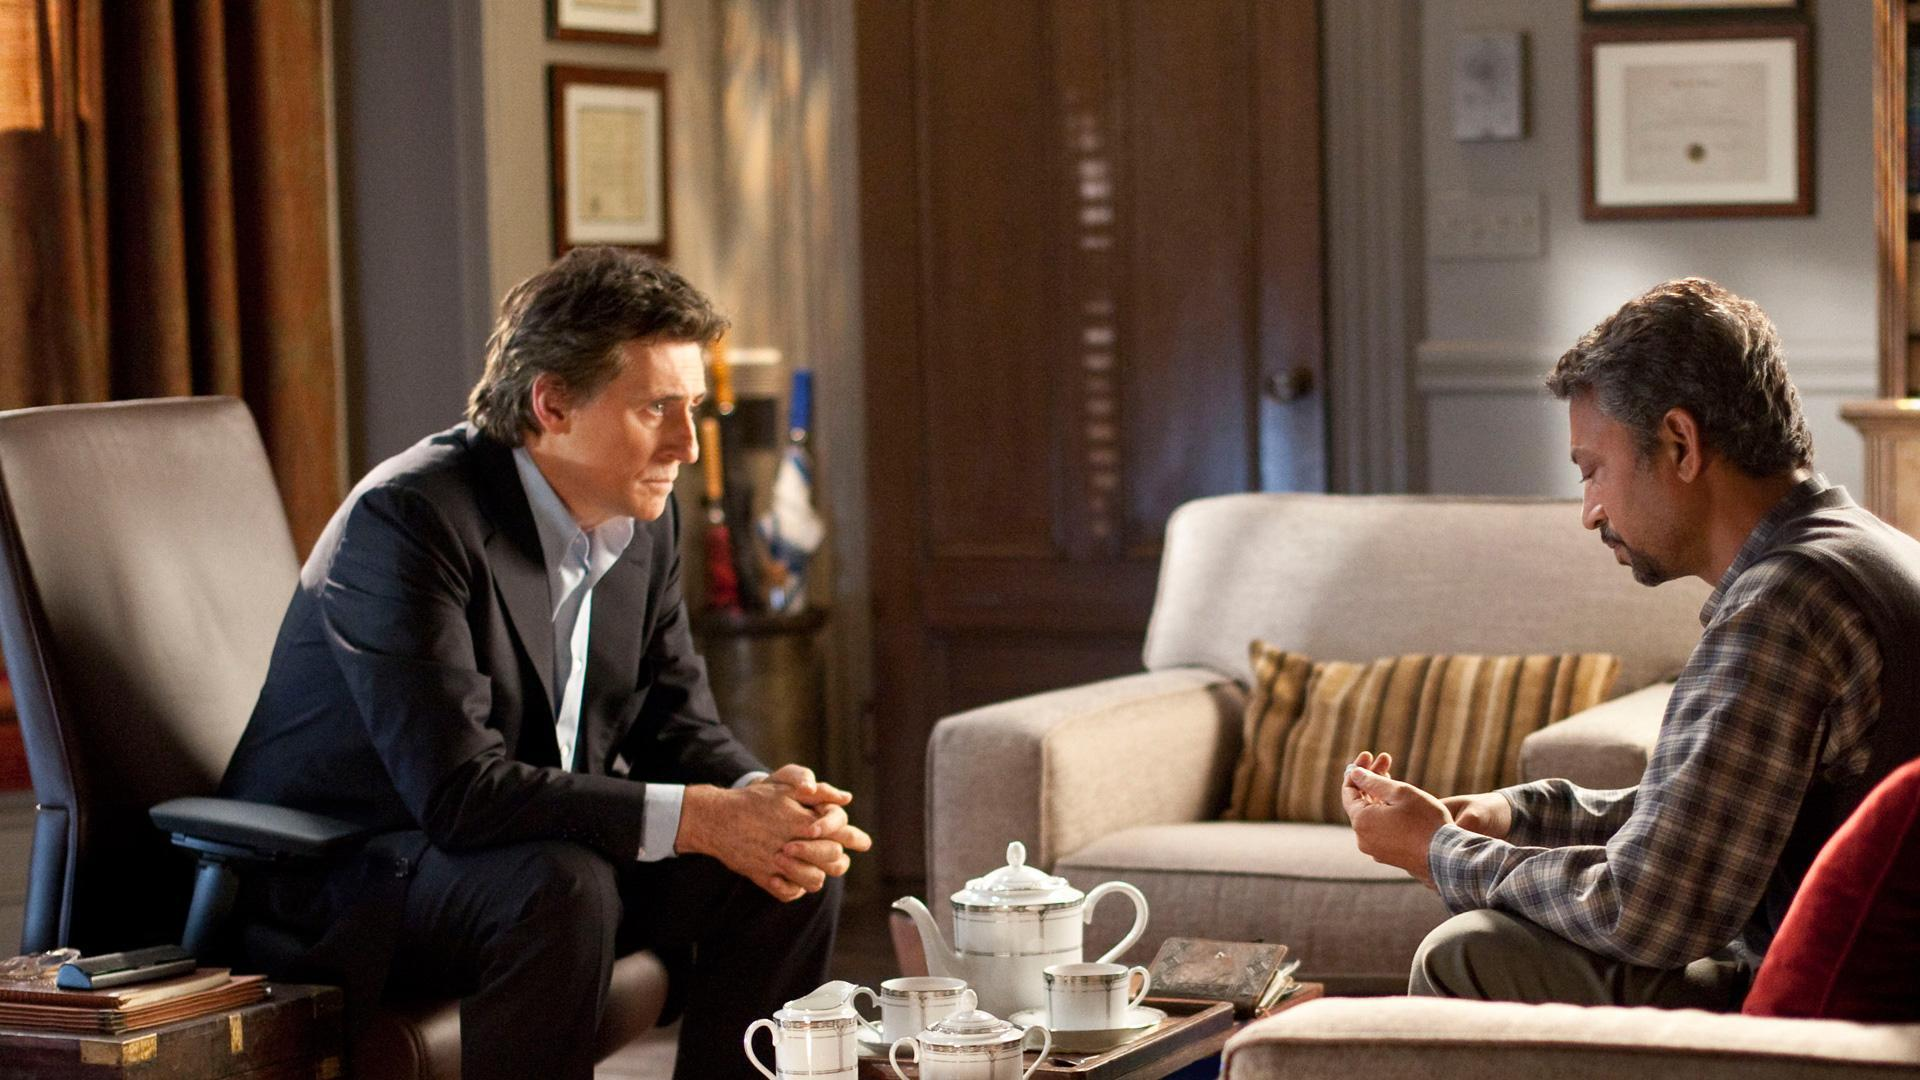 Terapia - HBO rozważa reboot serialu